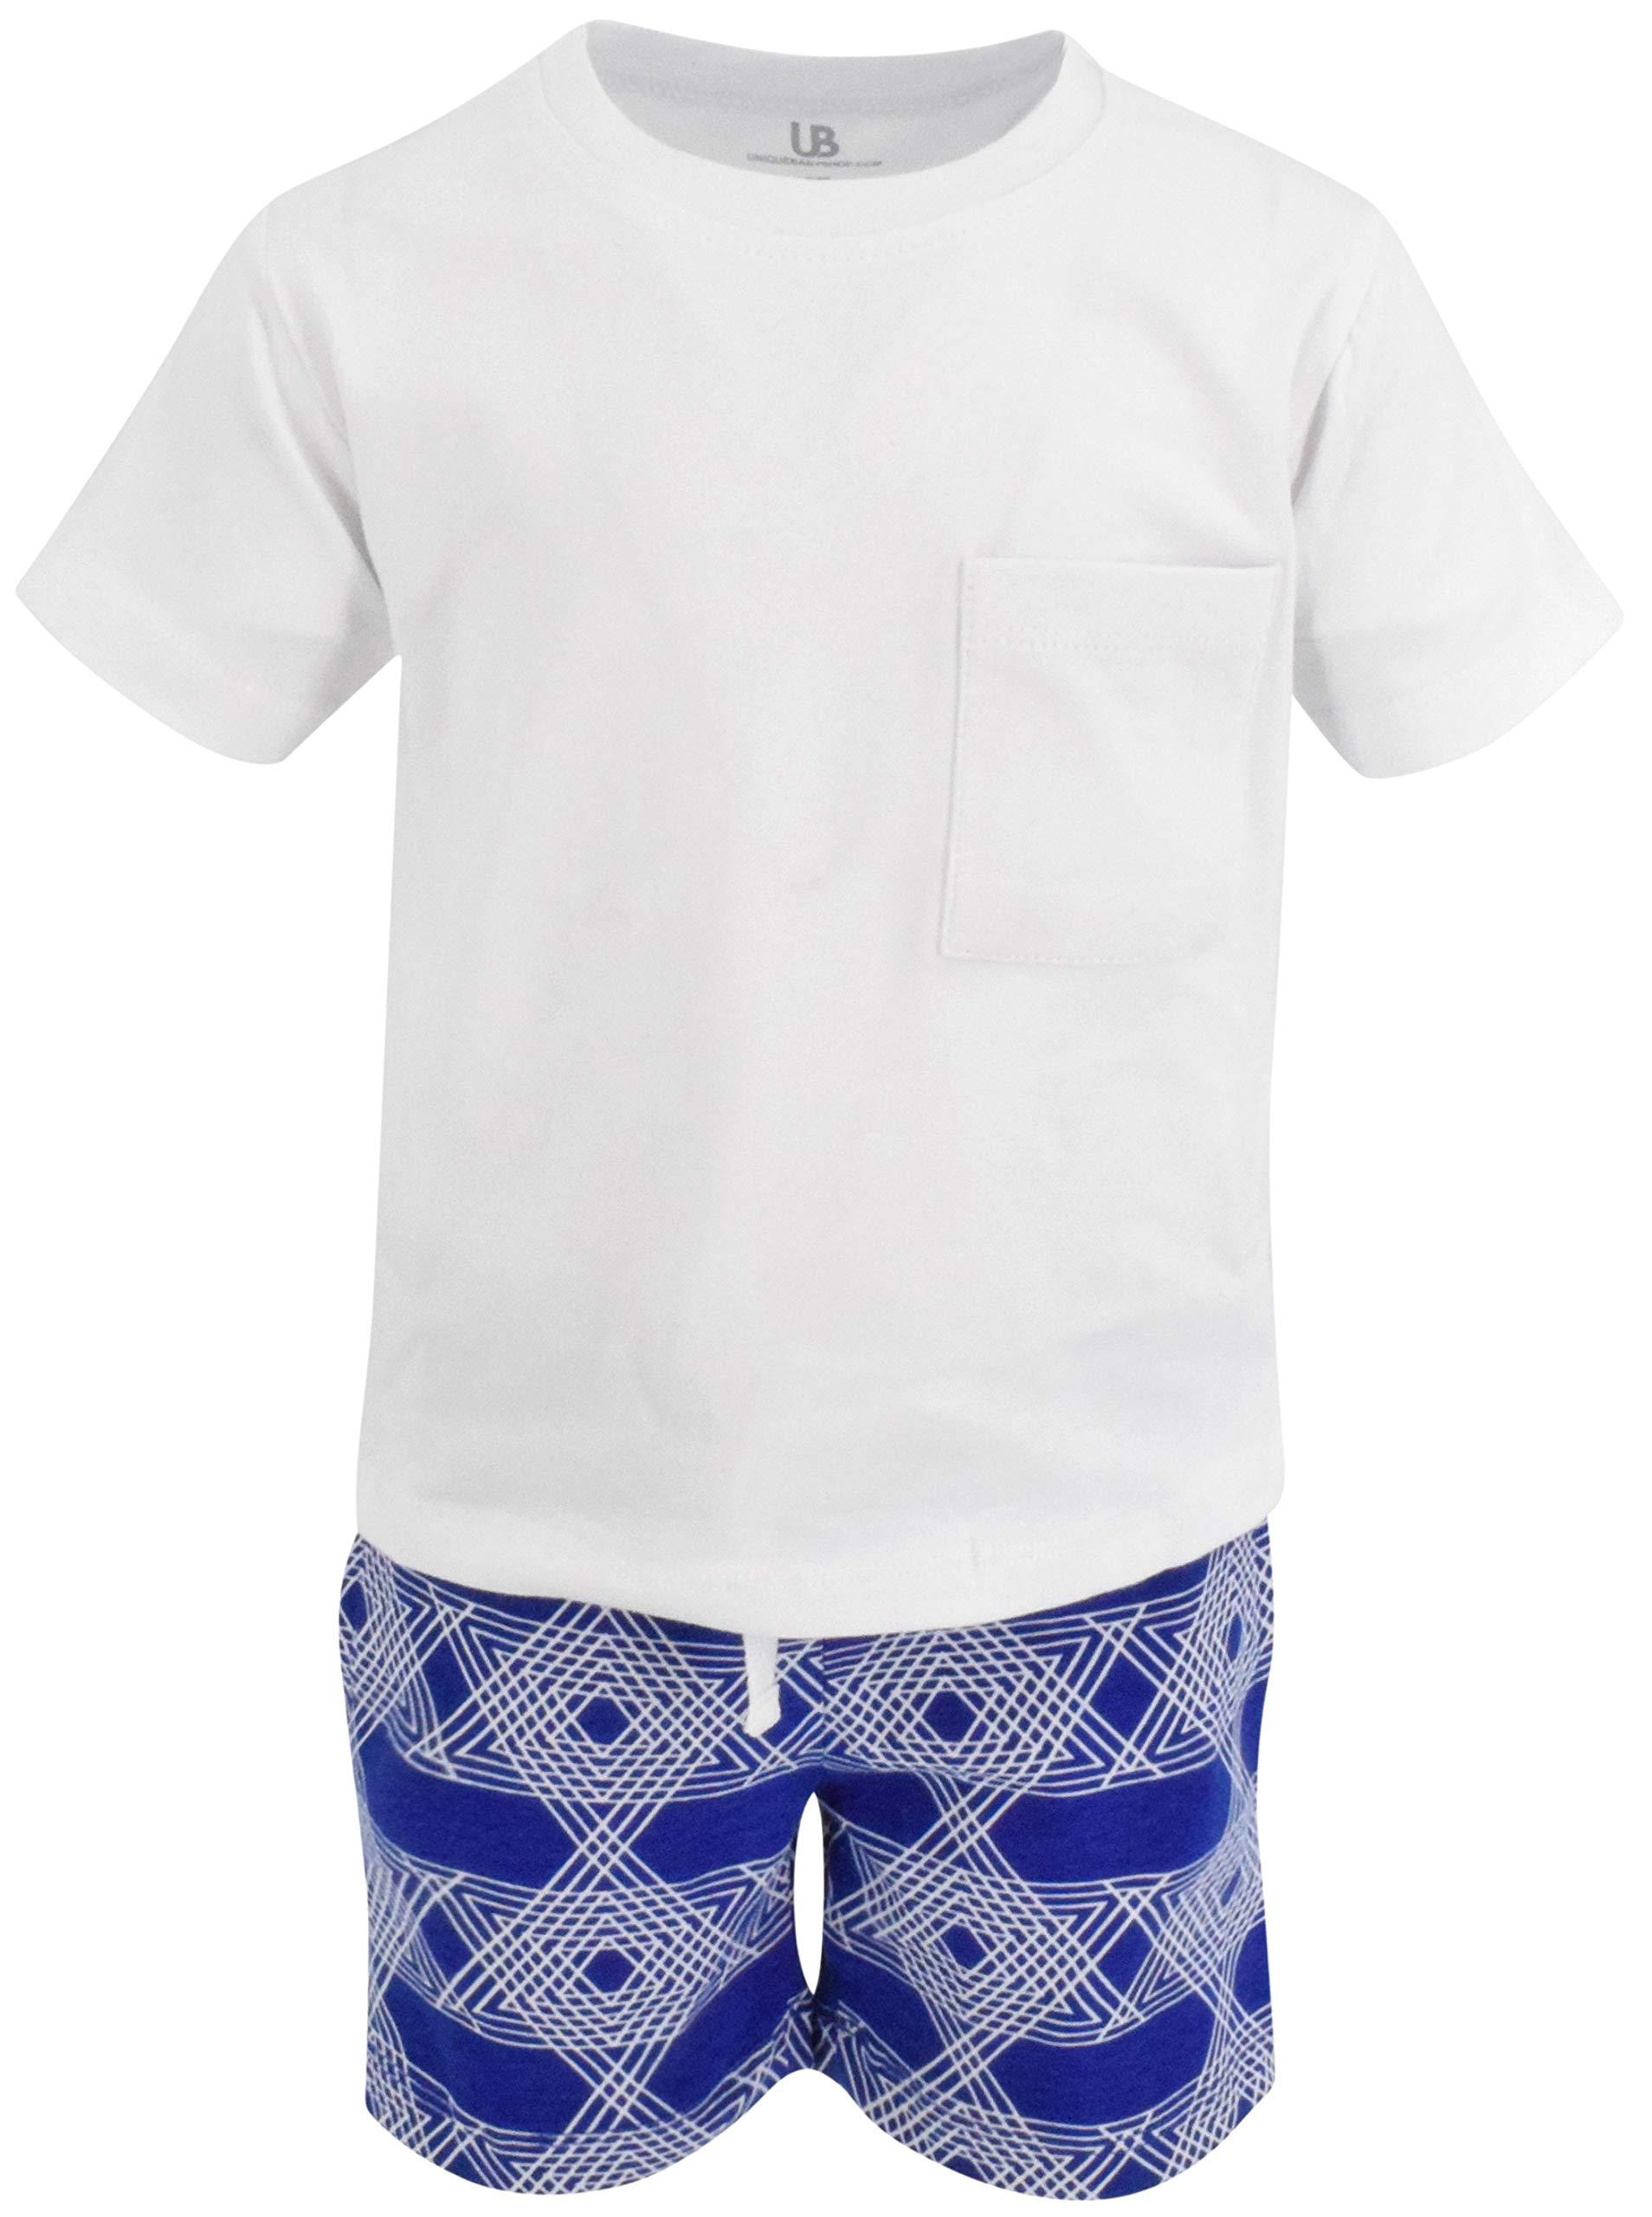 Unique Baby Boys 2 Piece Star of David Print Hanukkah Outfit Shirt Shorts (7)